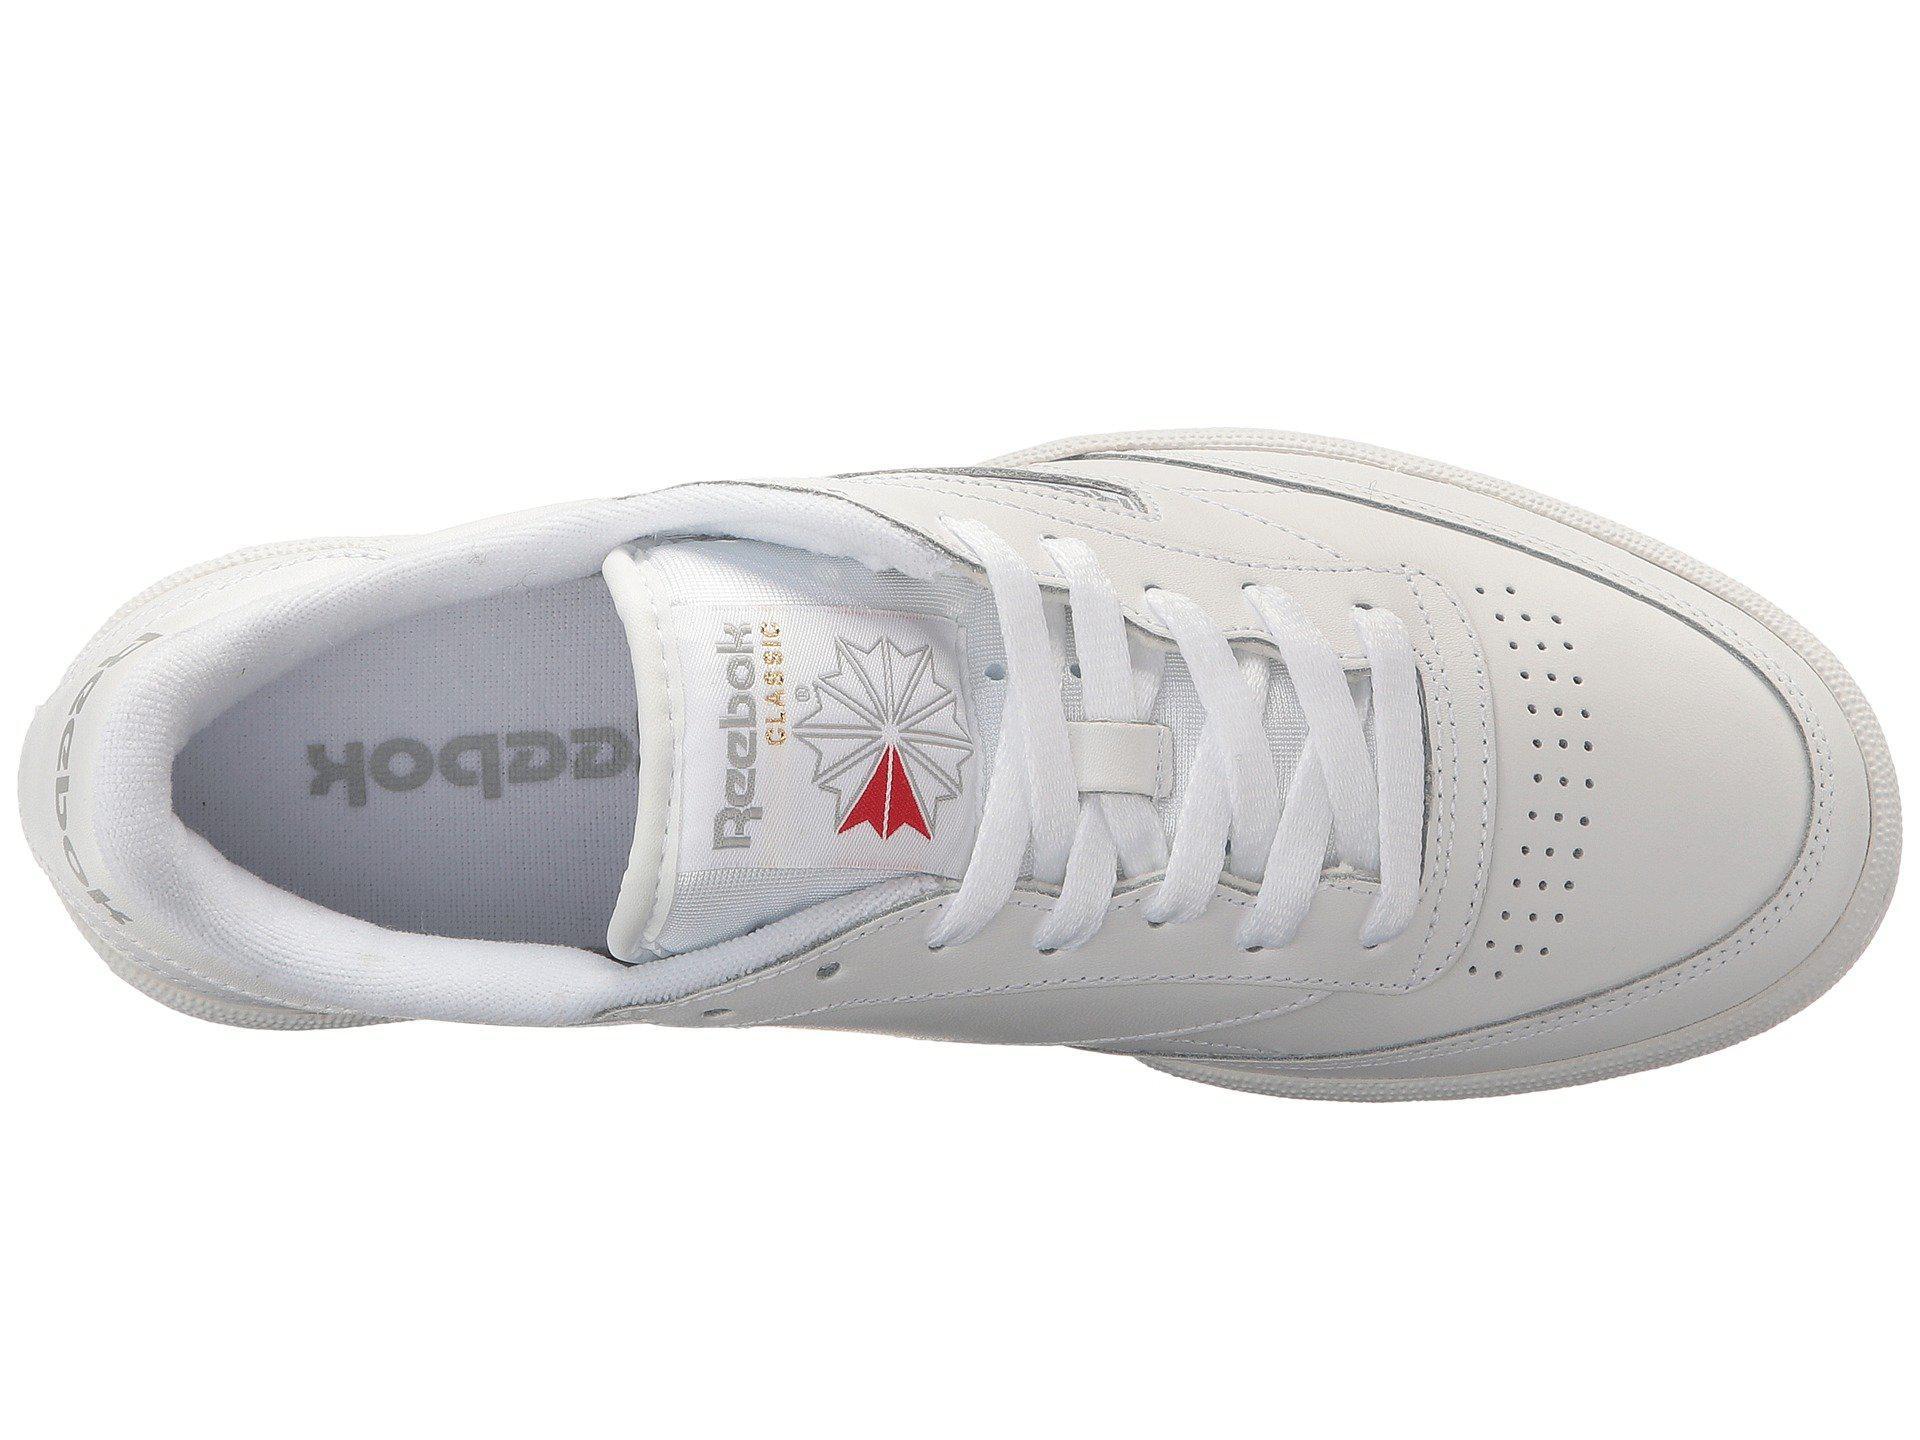 f9b838b5a30b Reebok - White Club C 85 (int black charcoal) Men s Shoes for. View  fullscreen